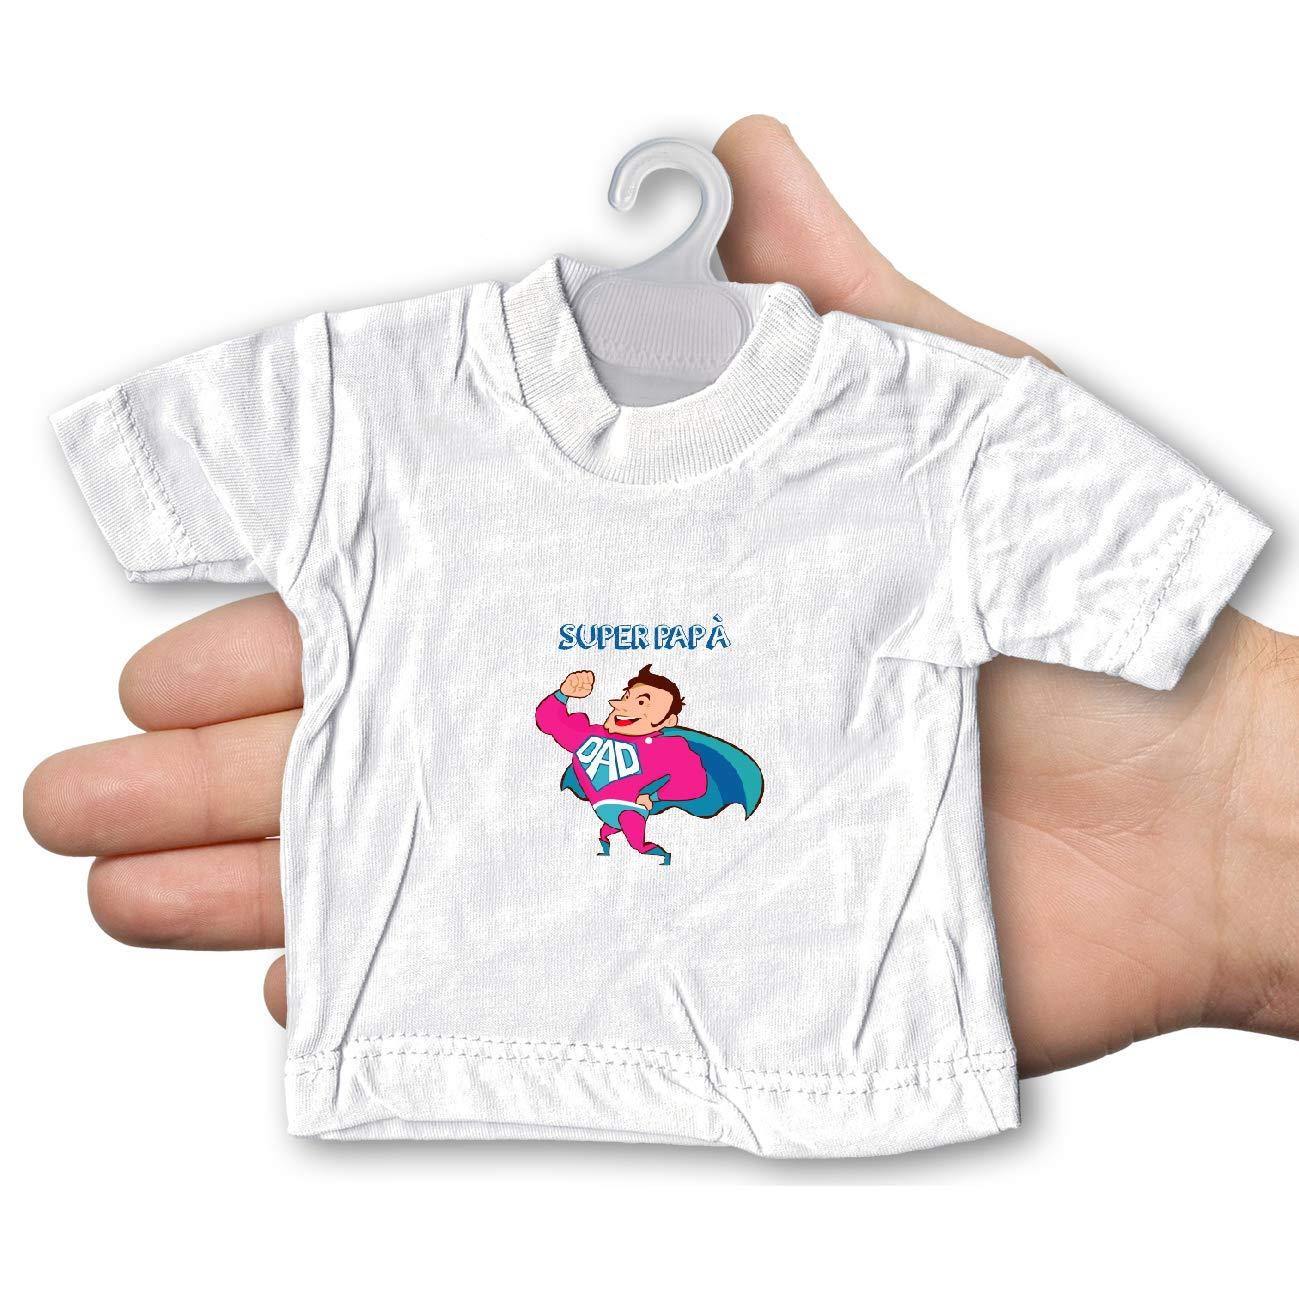 My Custom Style Mini T-Shirt per Auto #Festa del pap/à Auguri2# Azzurra